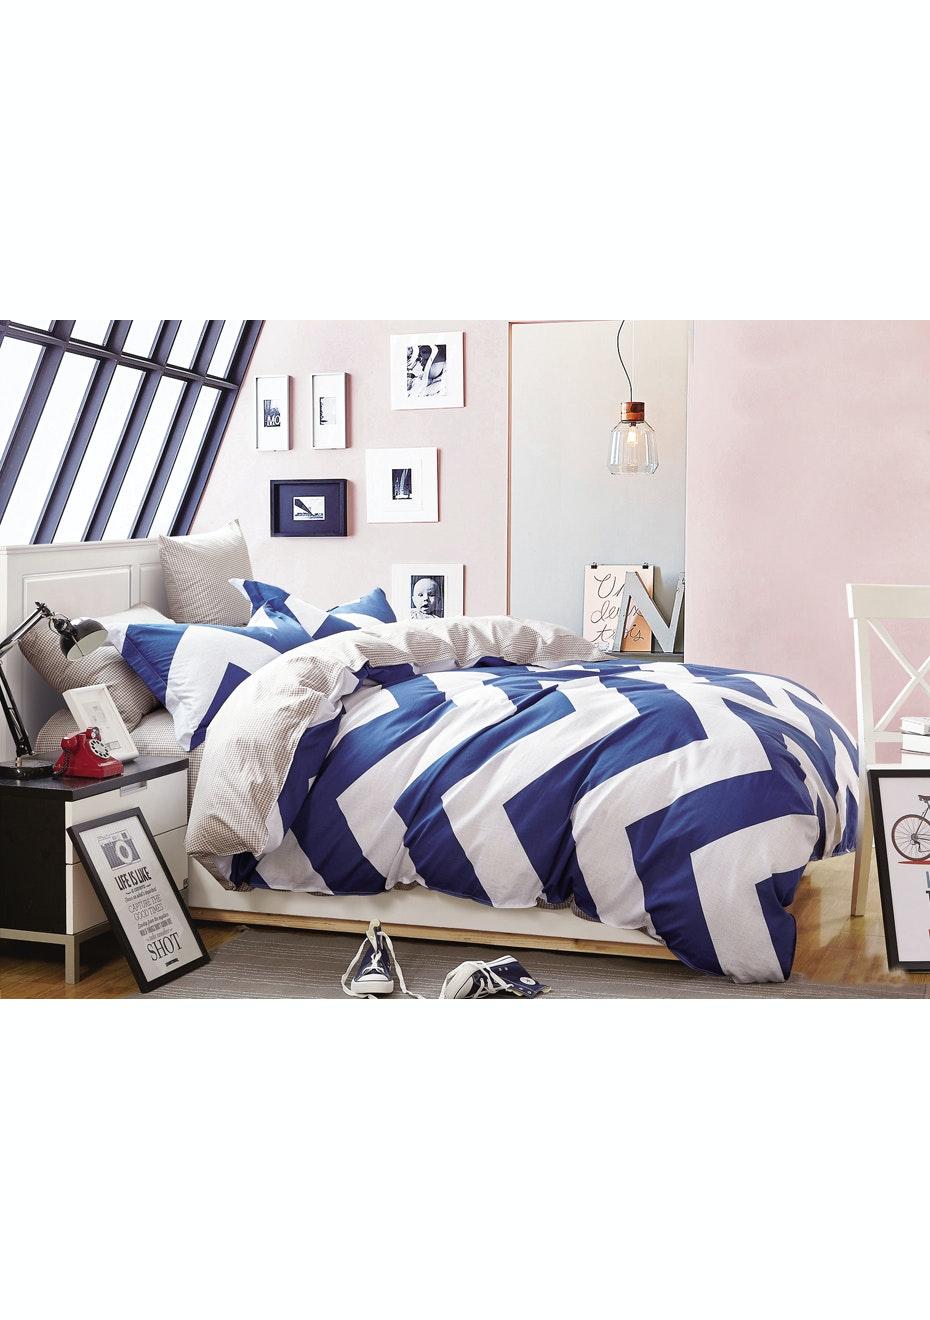 San Diego Quilt Cover Set - Reversible Design - 100% Cotton Single Bed